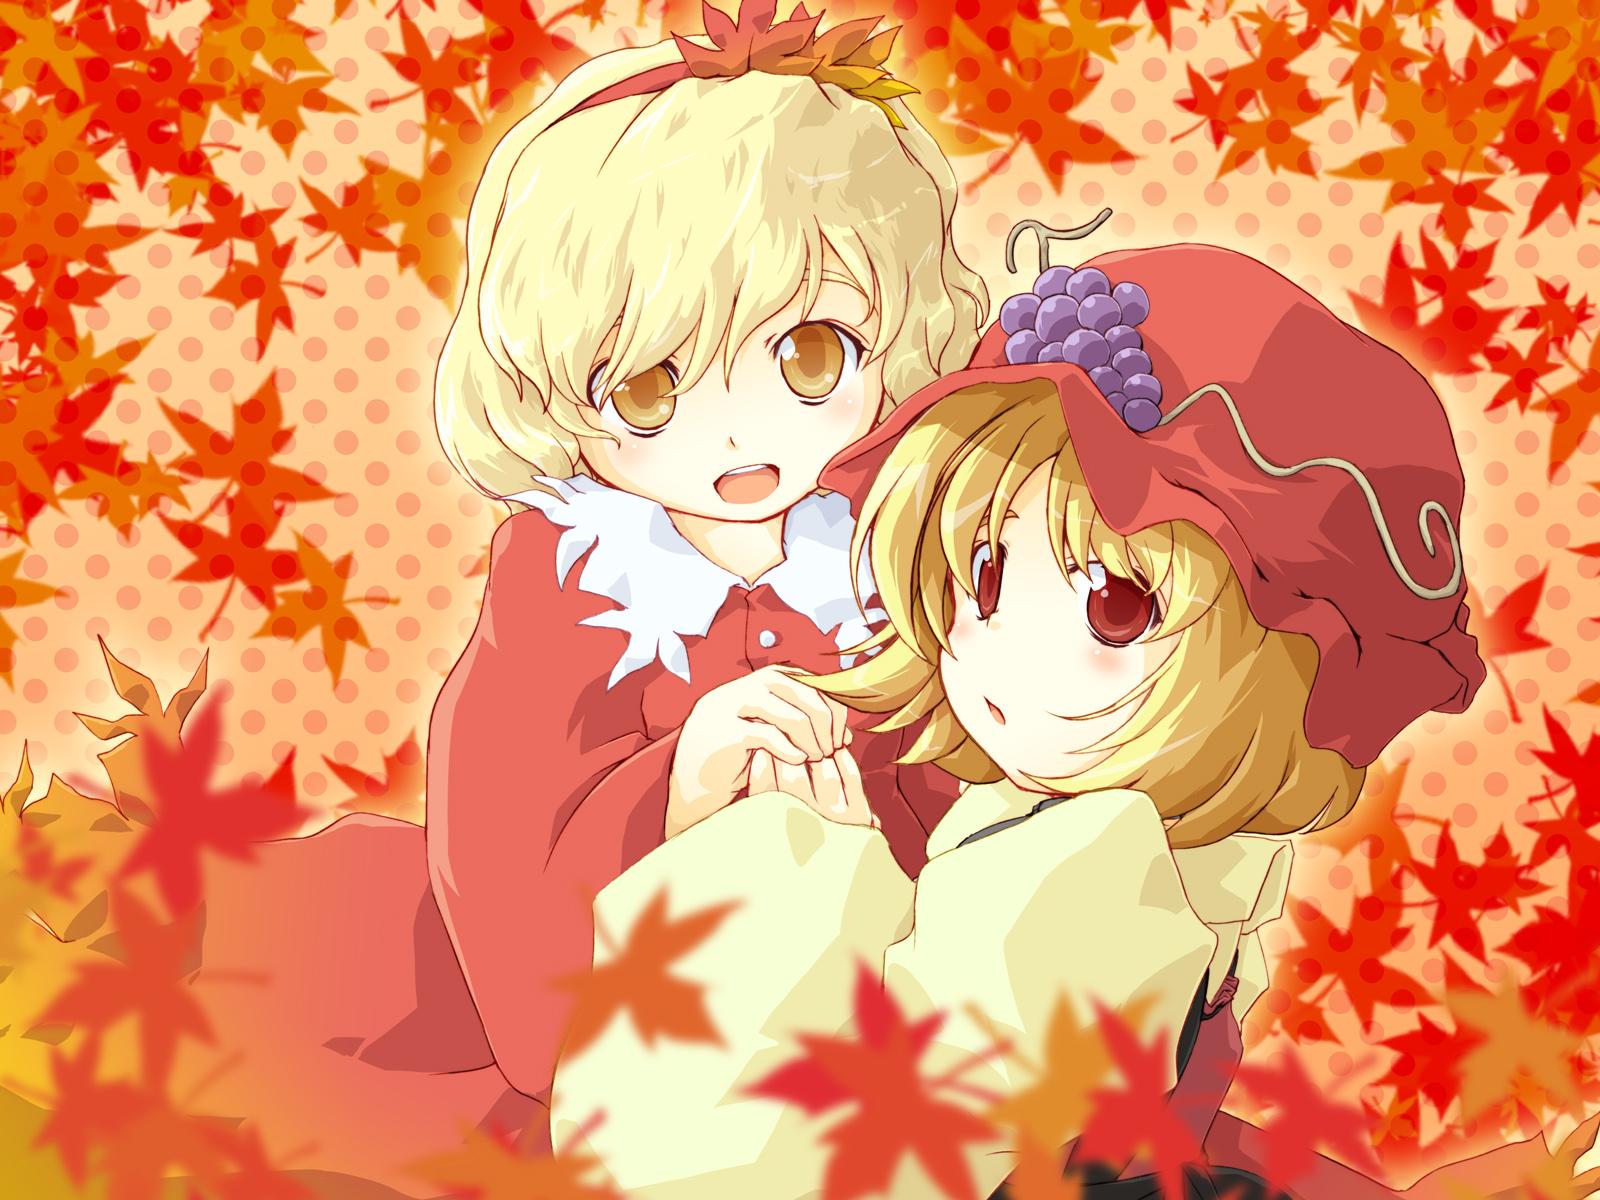 aki_minoriko aki_shizuha autumn food fruit hat leaves touhou